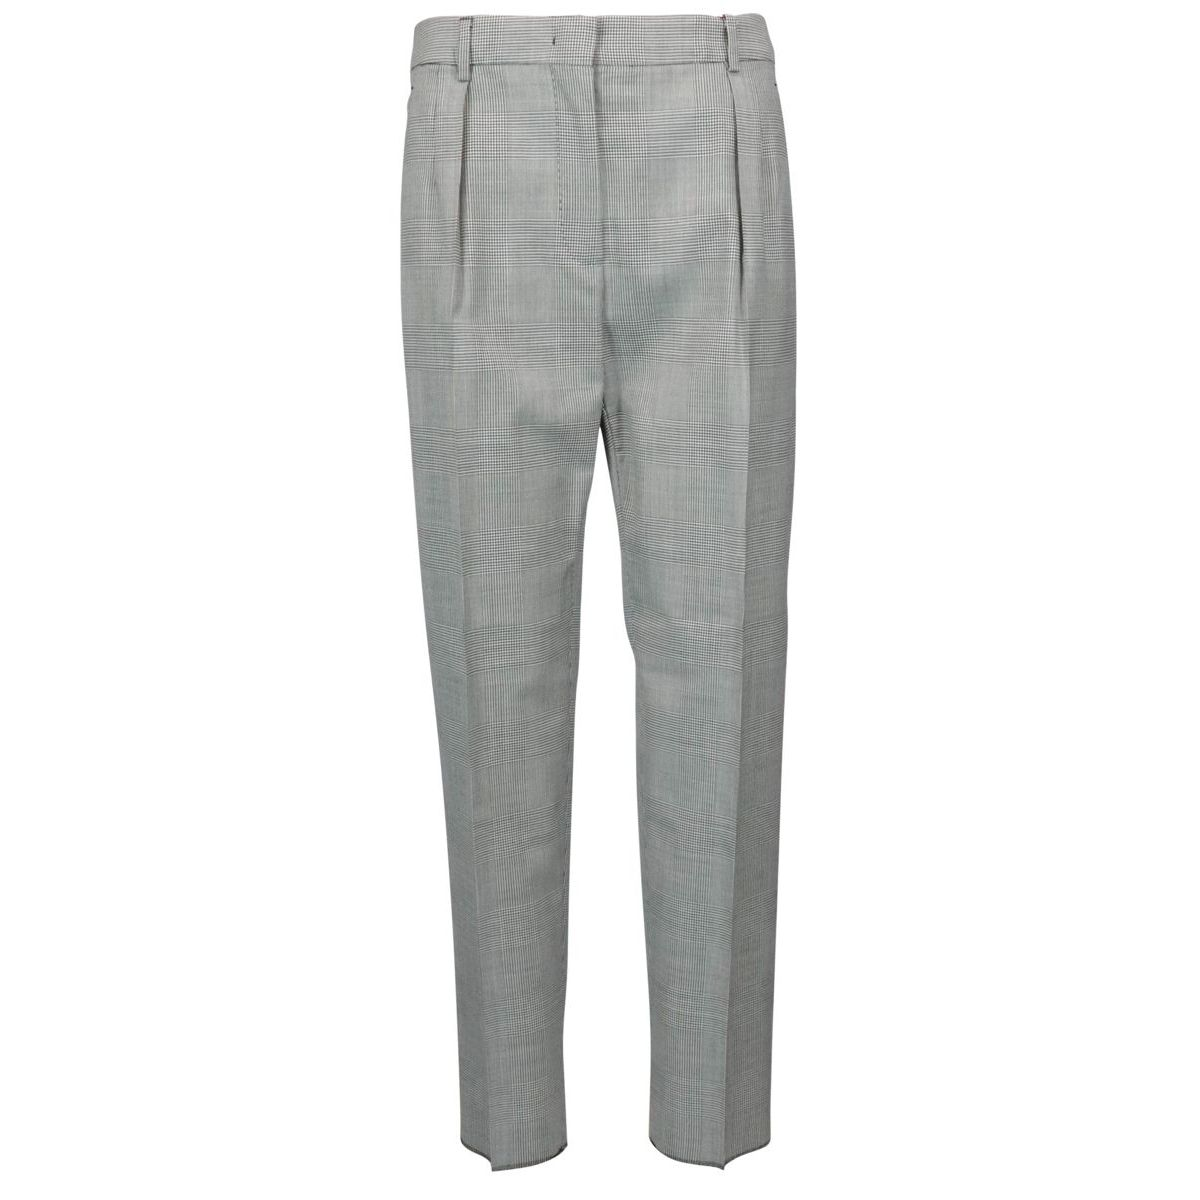 Lyon wool trousers with Prince of Wales pattern White black MAX MARA STUDIO